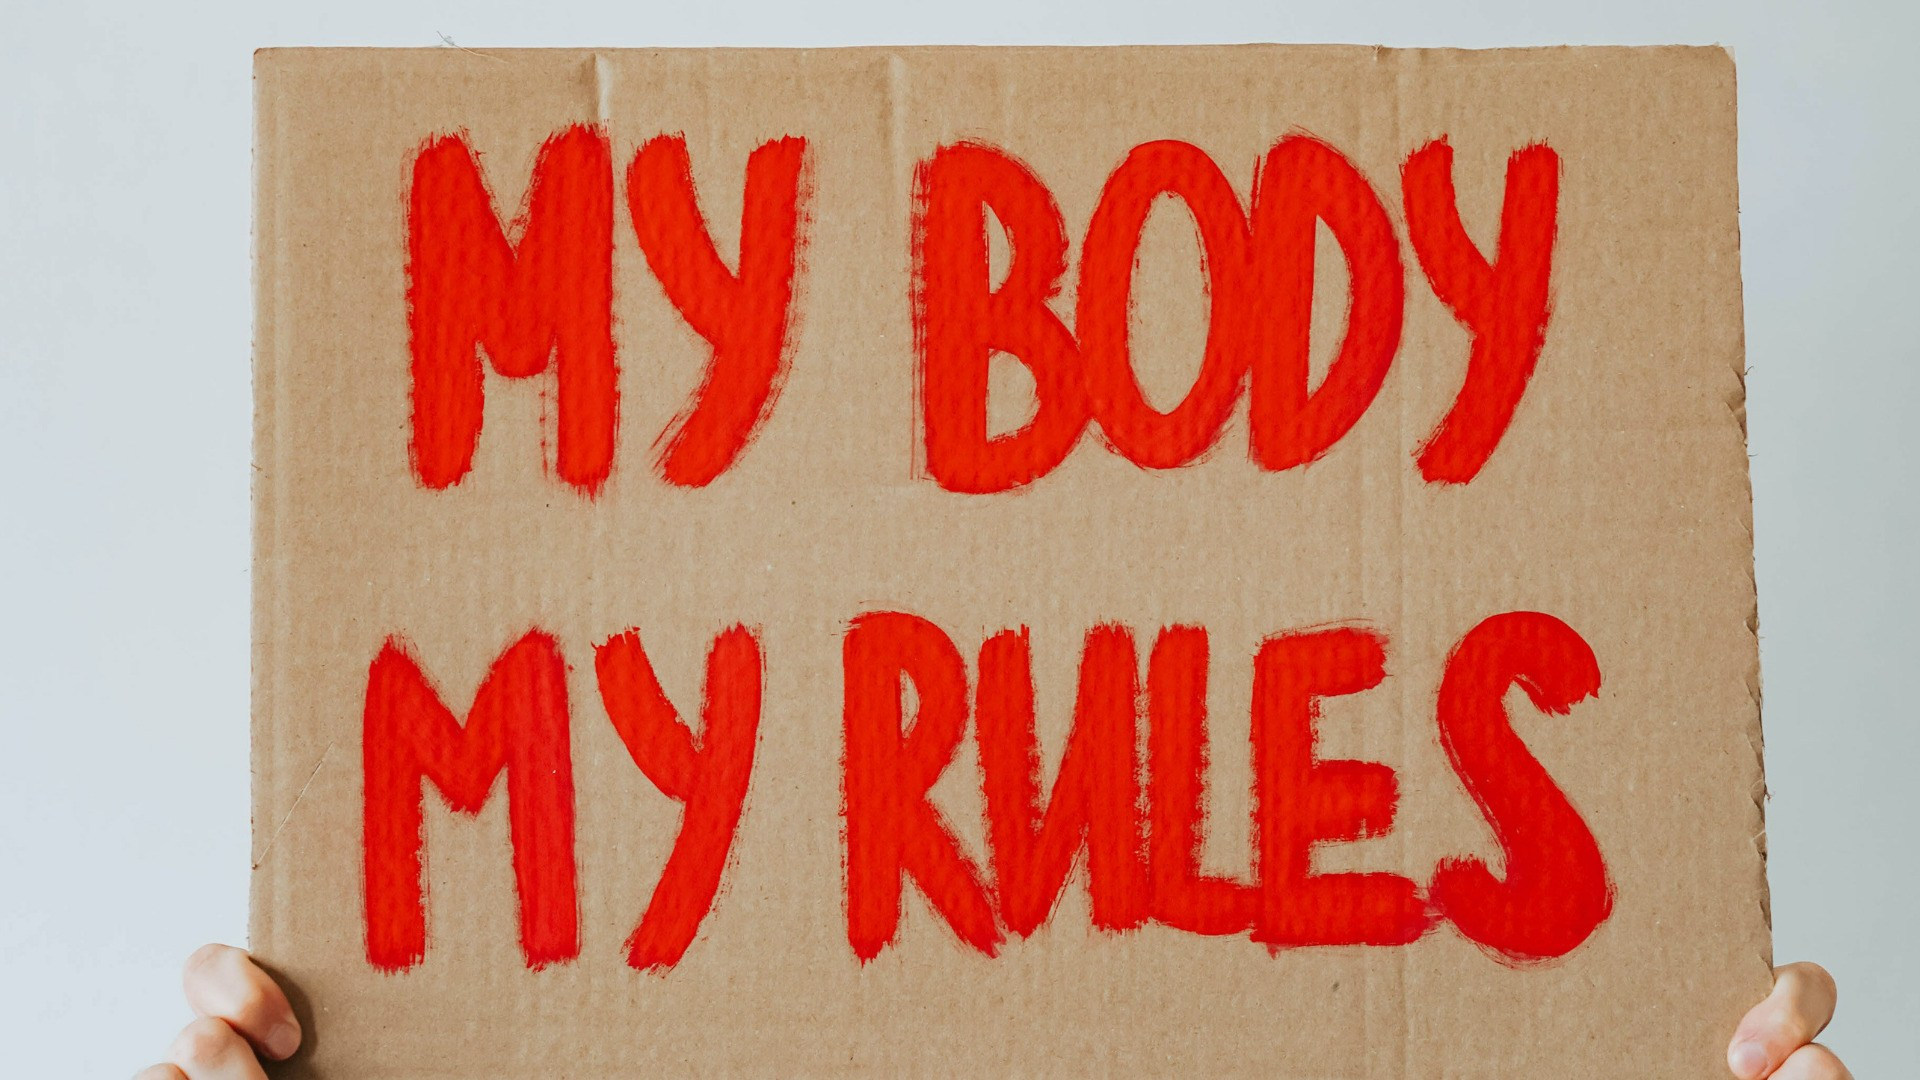 My-body-my-rules pexels-olia-danilevich